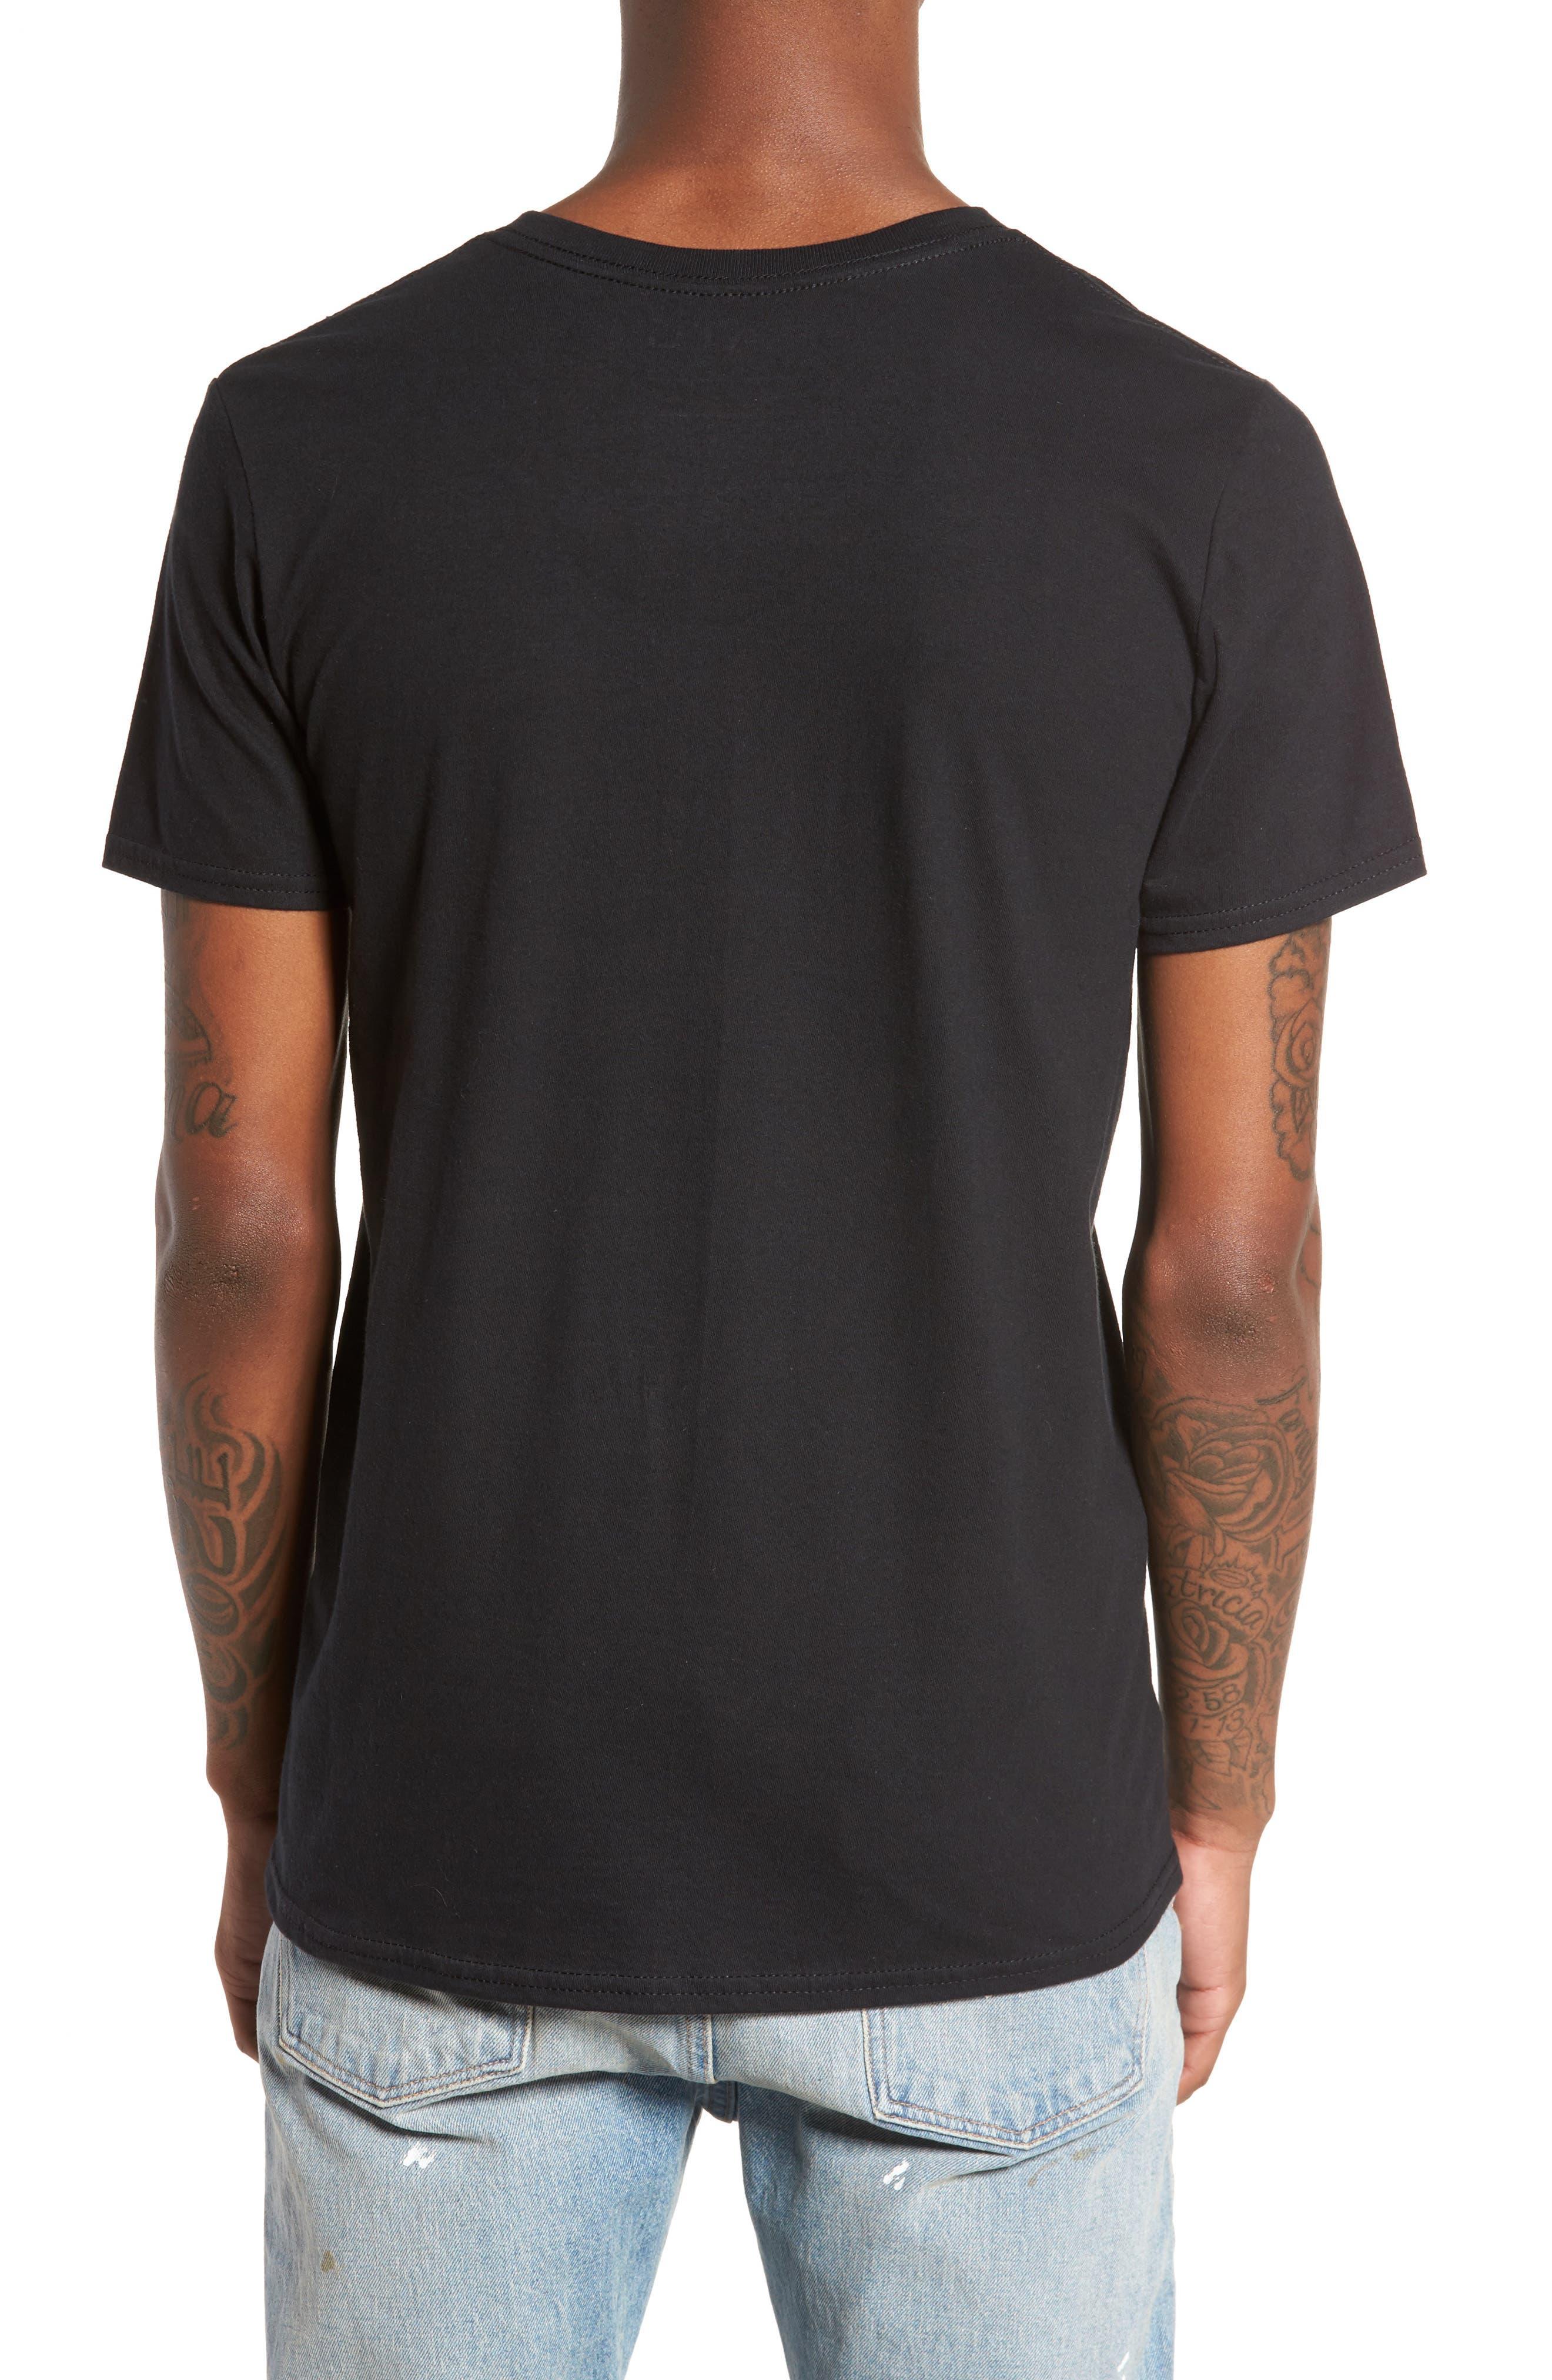 Tis The Season Embroidered T-Shirt,                             Alternate thumbnail 2, color,                             001